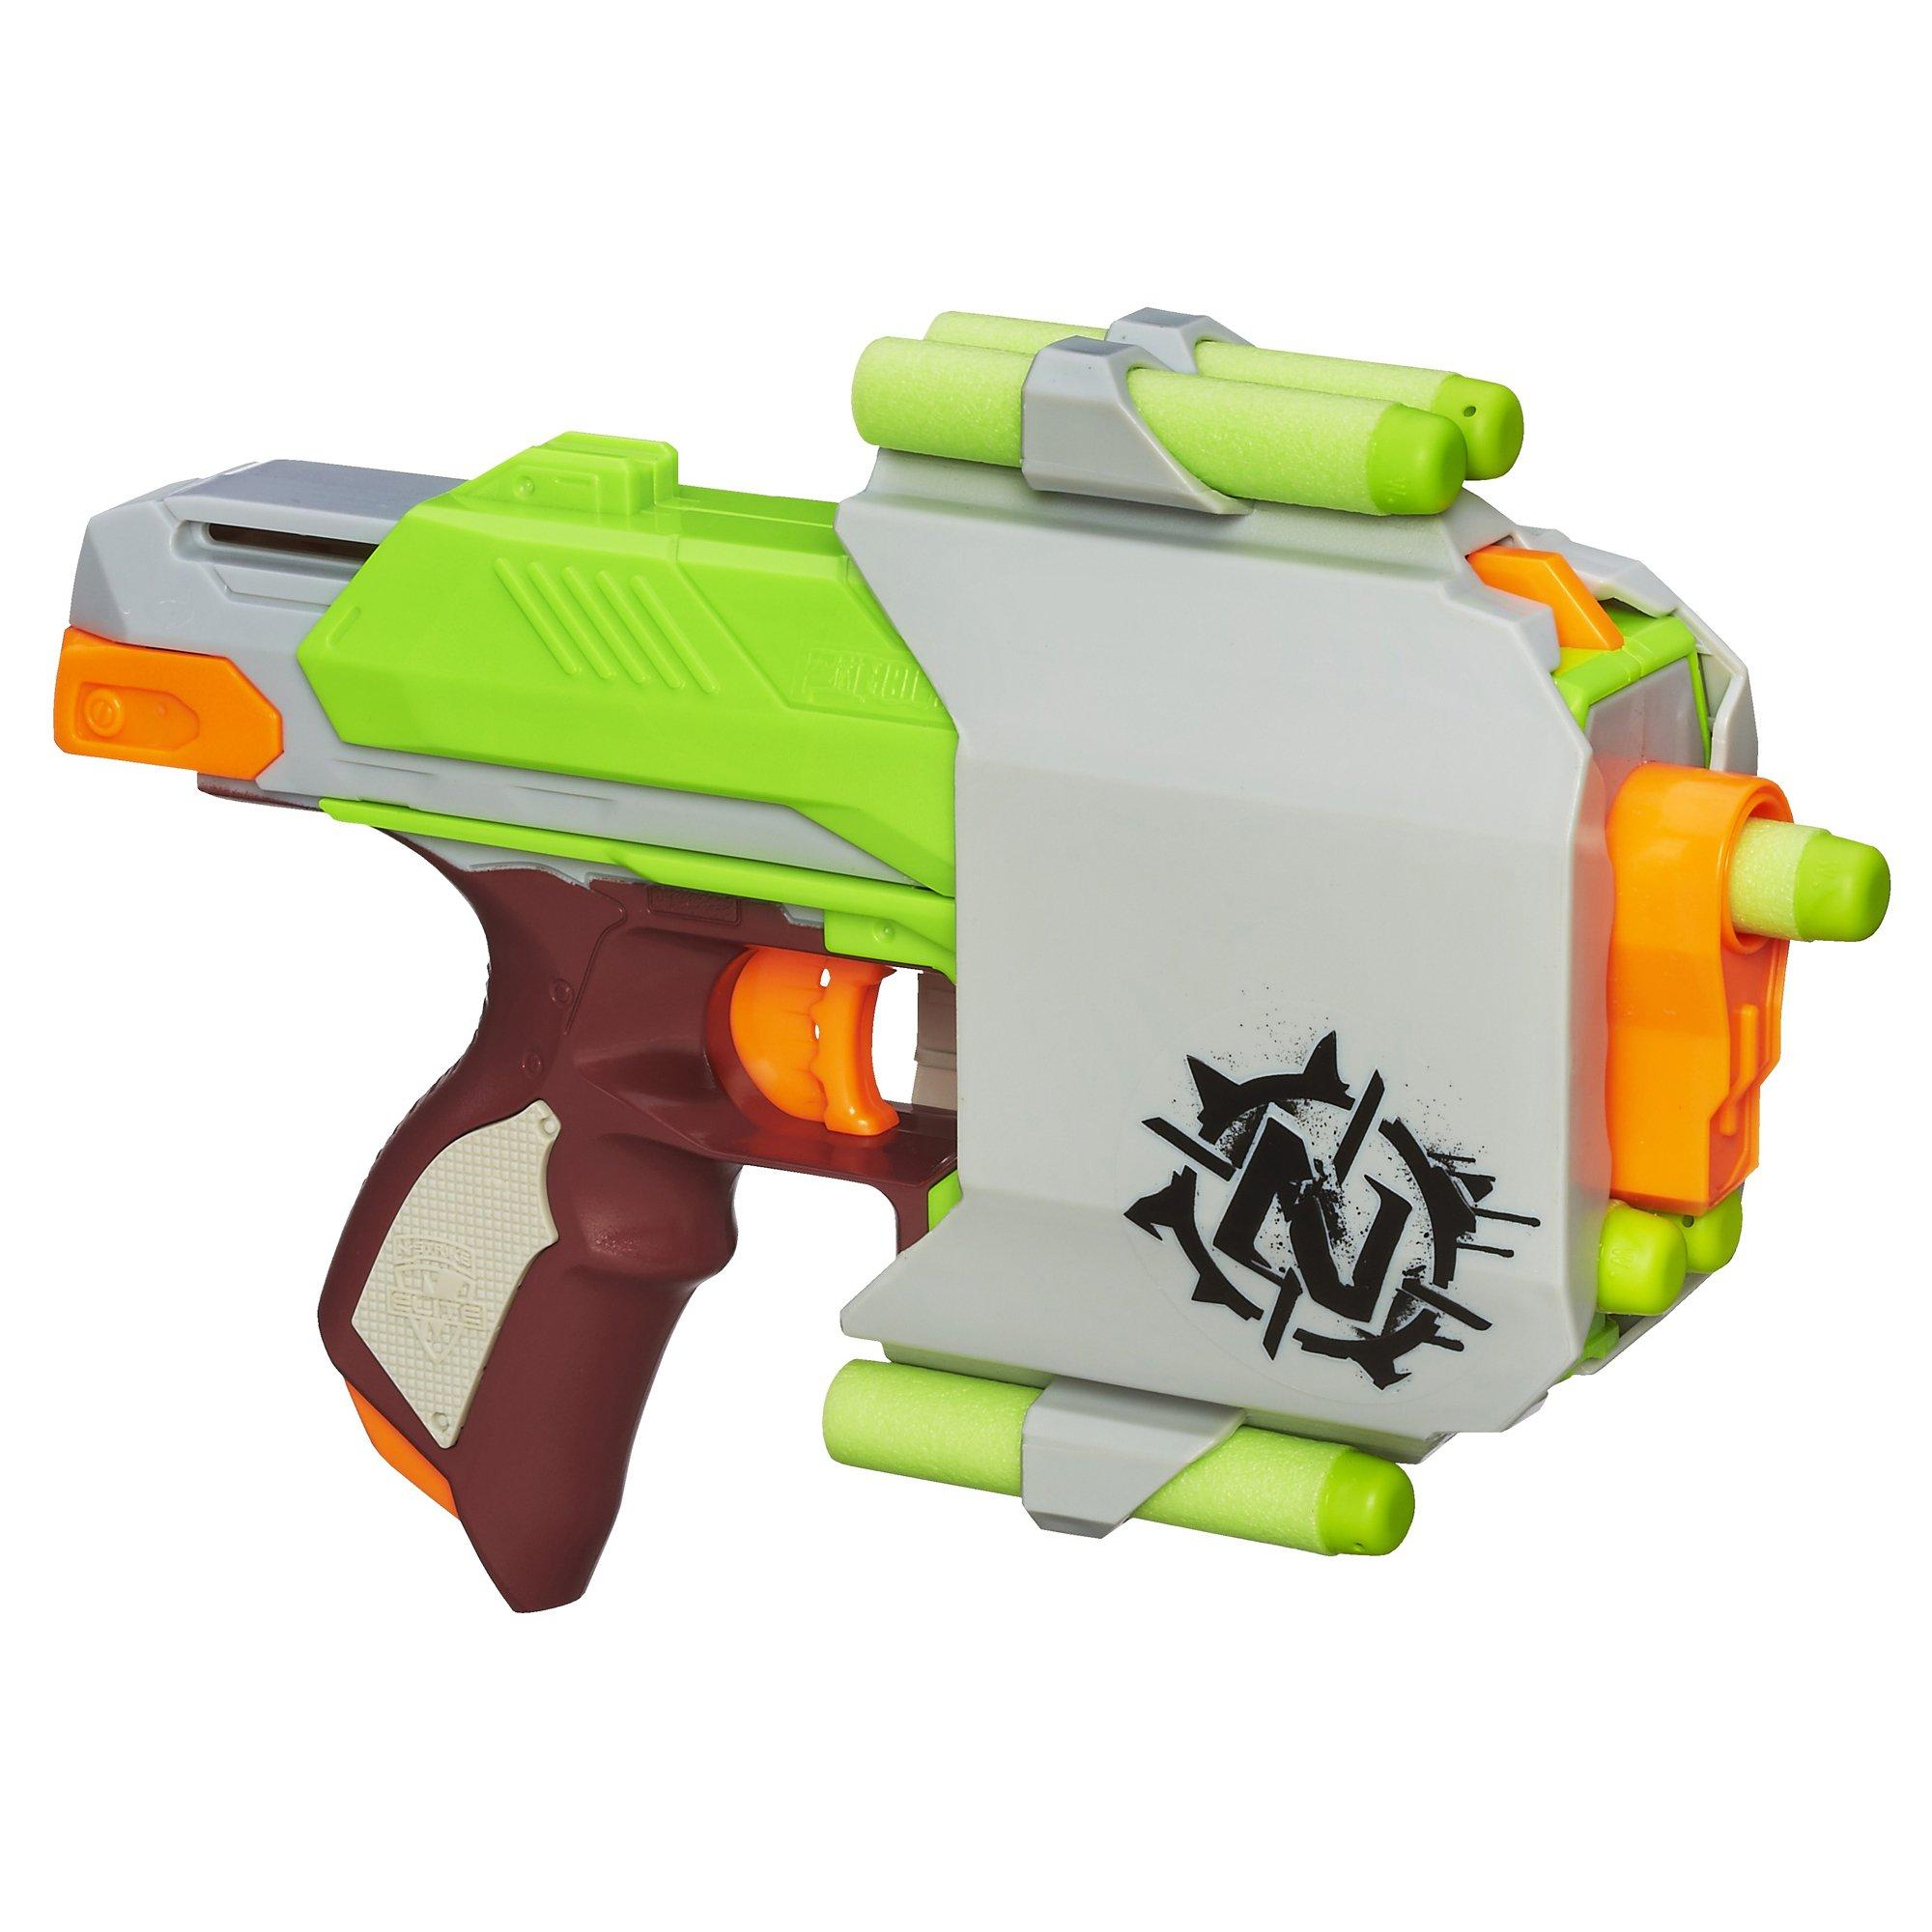 NERF Zombie Strike Sidestrike Blaster by NERF